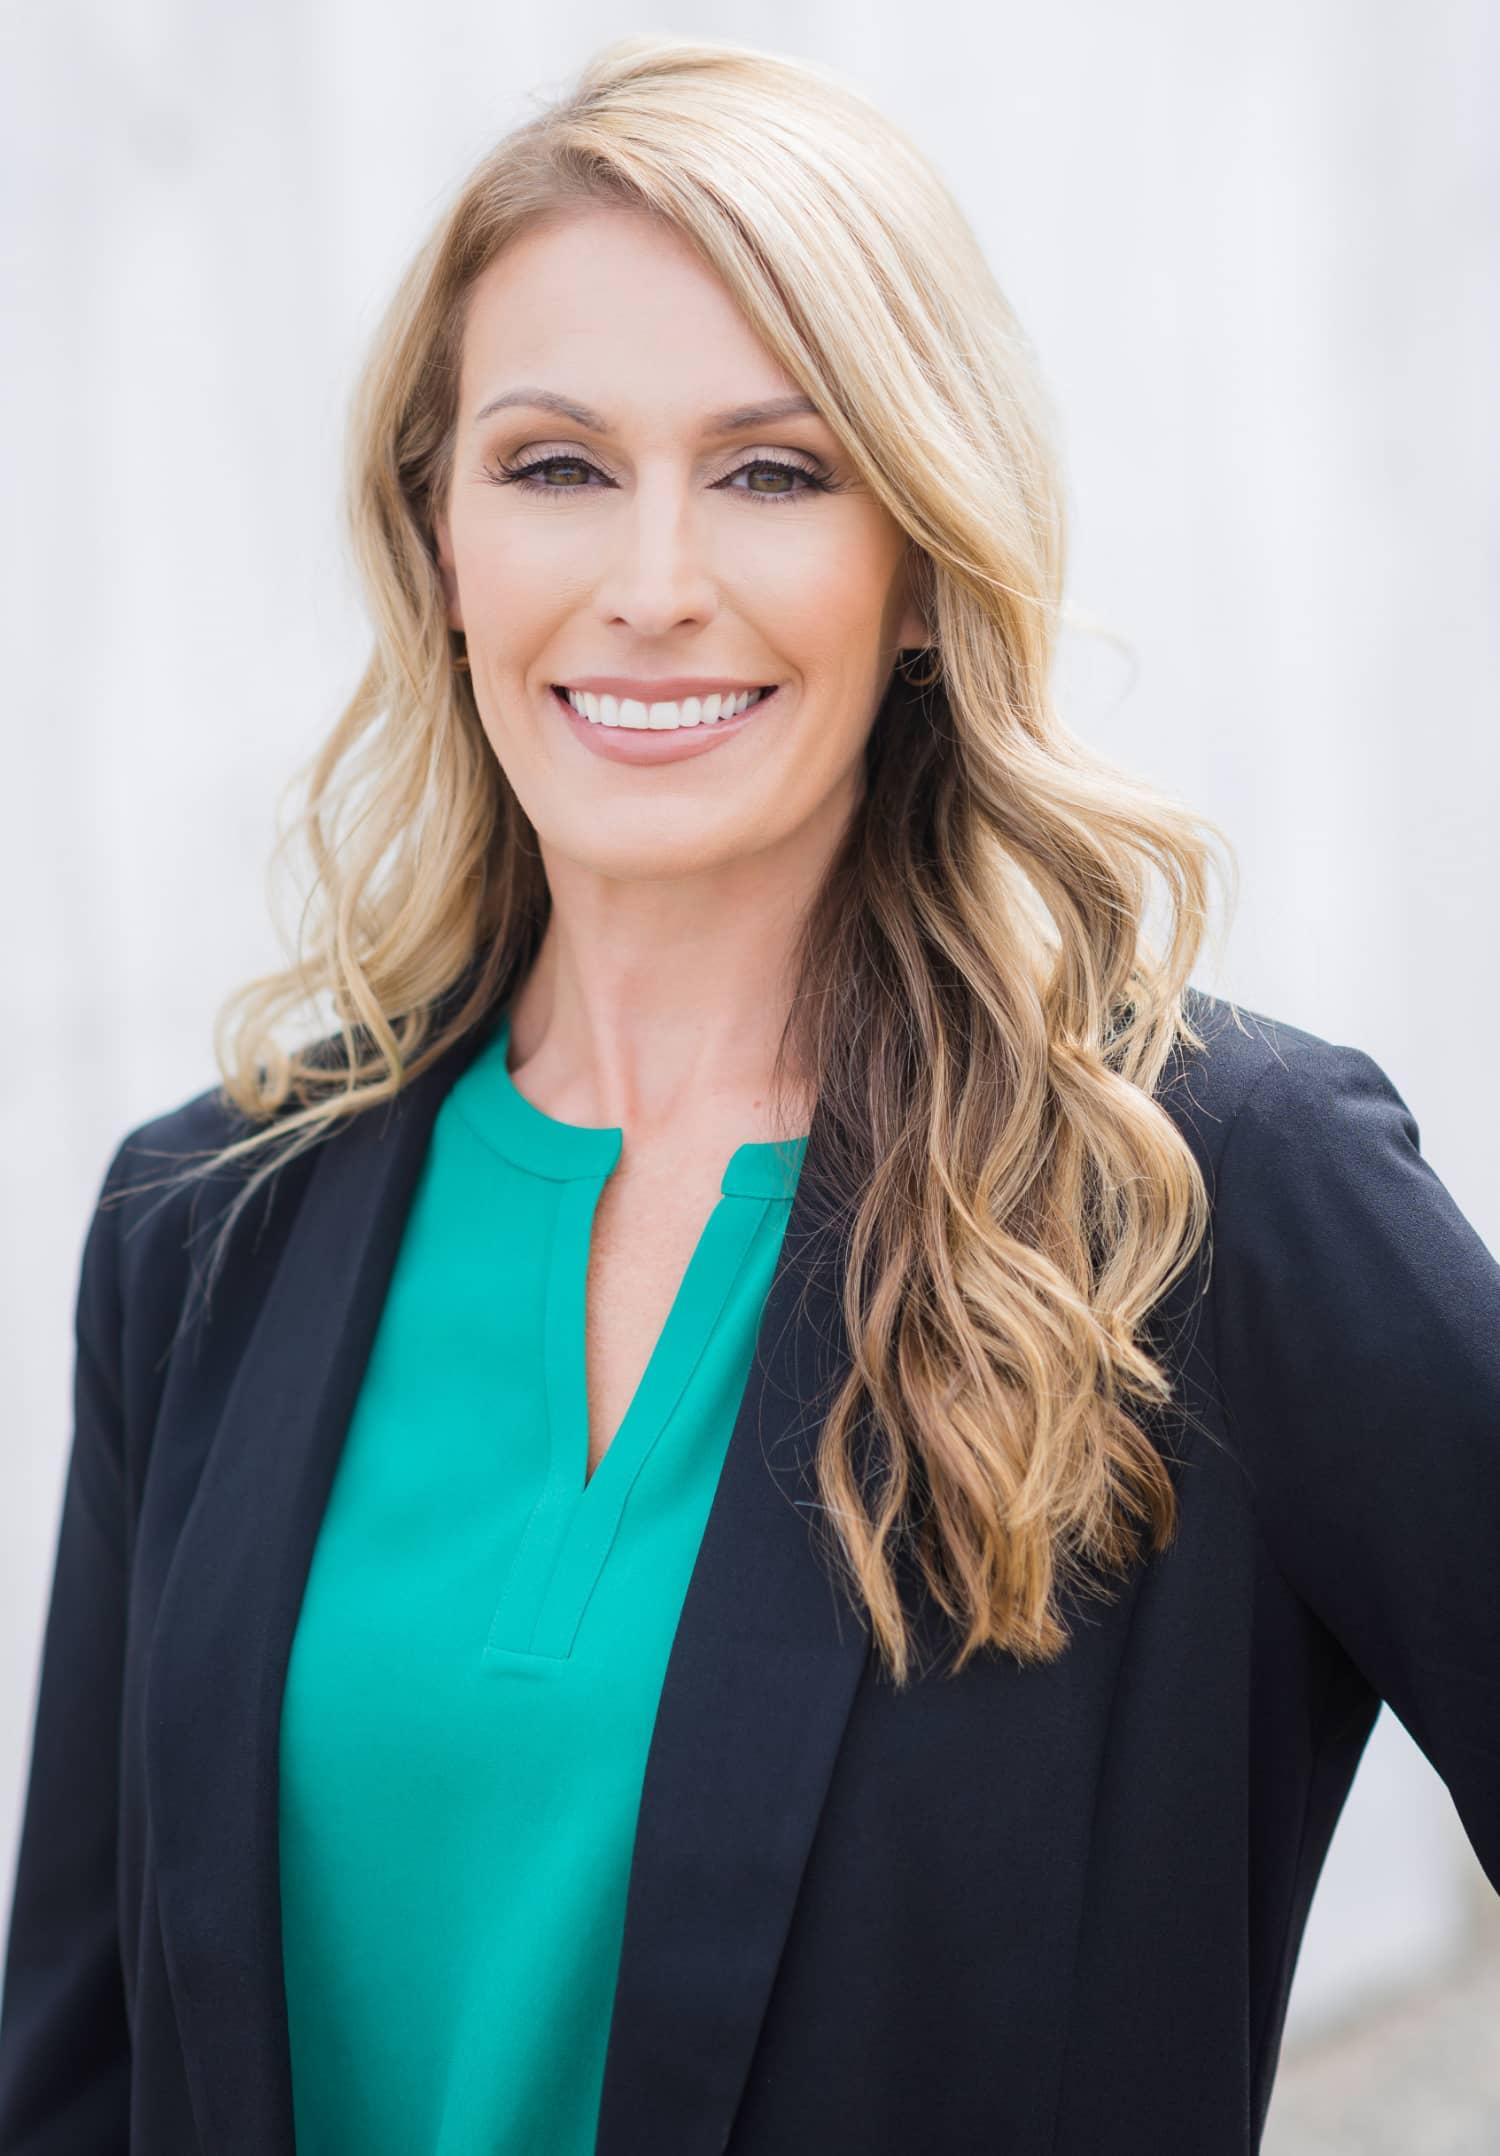 Erica Ramos